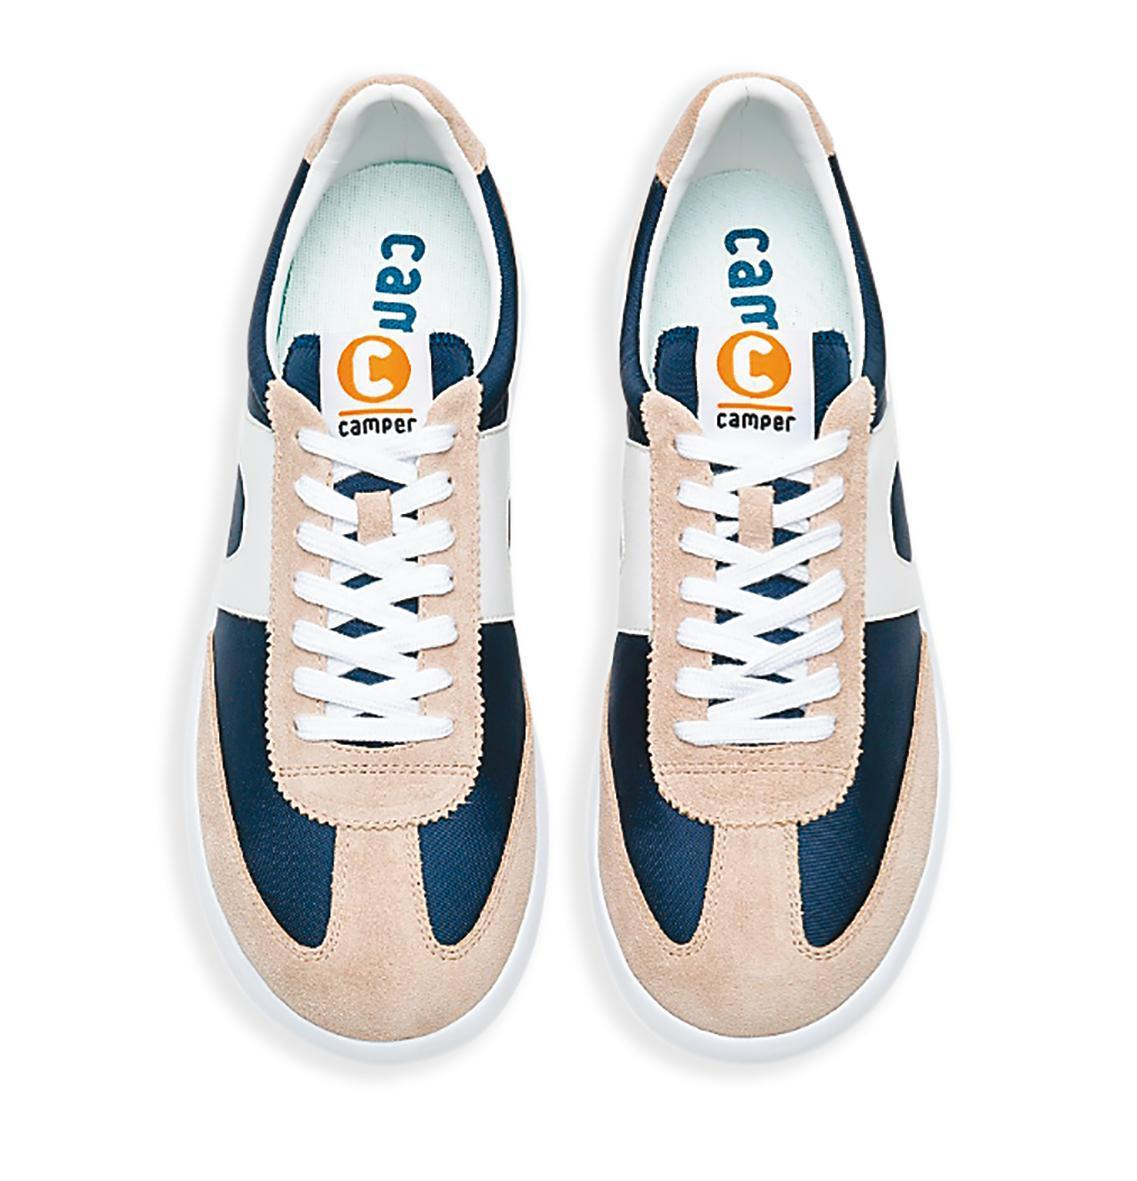 AMPER Pelotas XLF藍白棕配色休閒鞋。NT$5,580(團團提供)